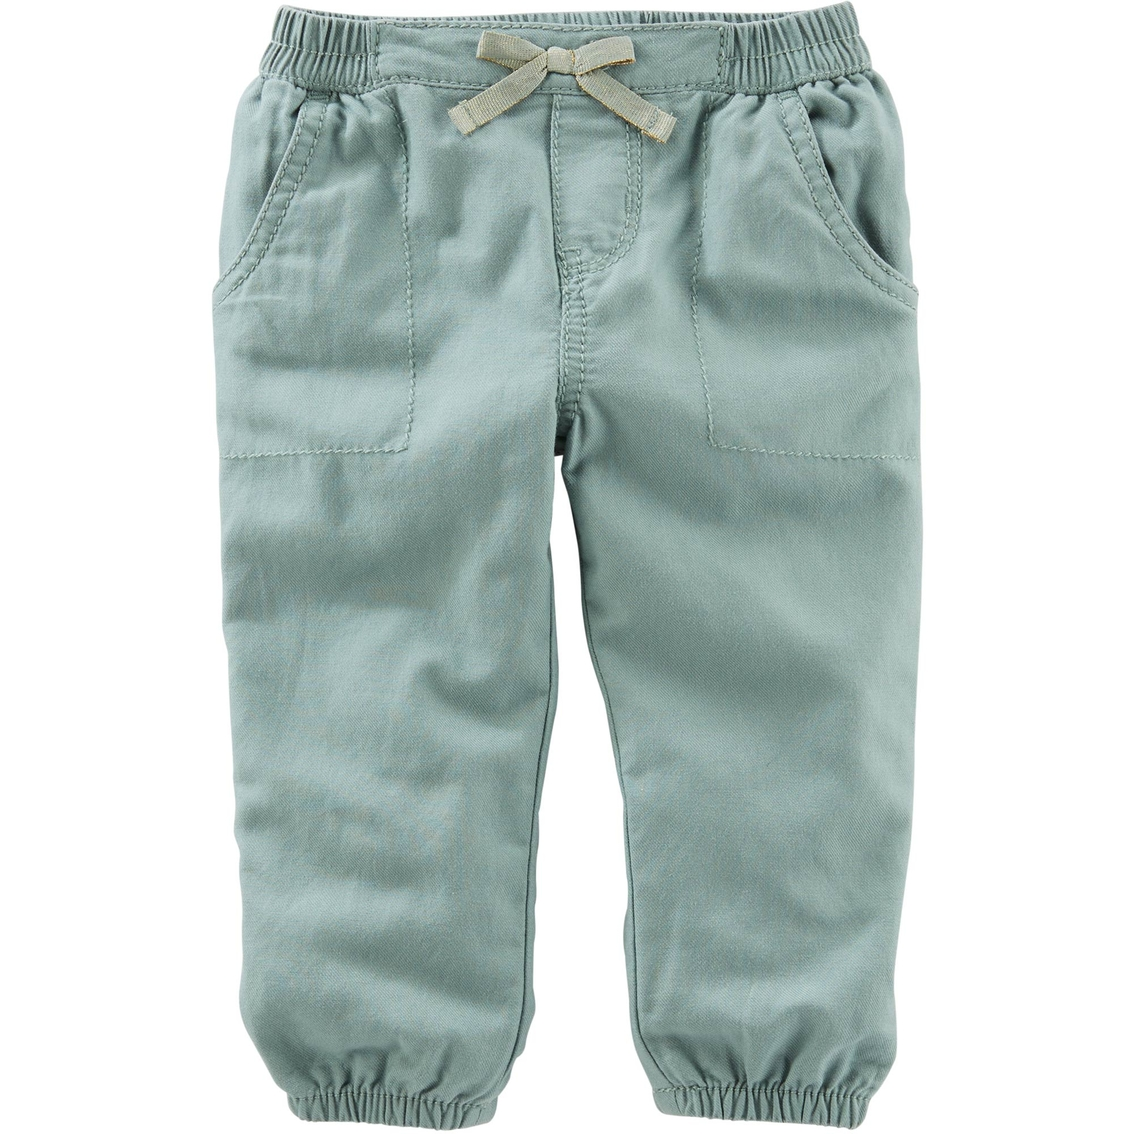 OshKosh BGosh Girls Jogger Pants Osh Kosh